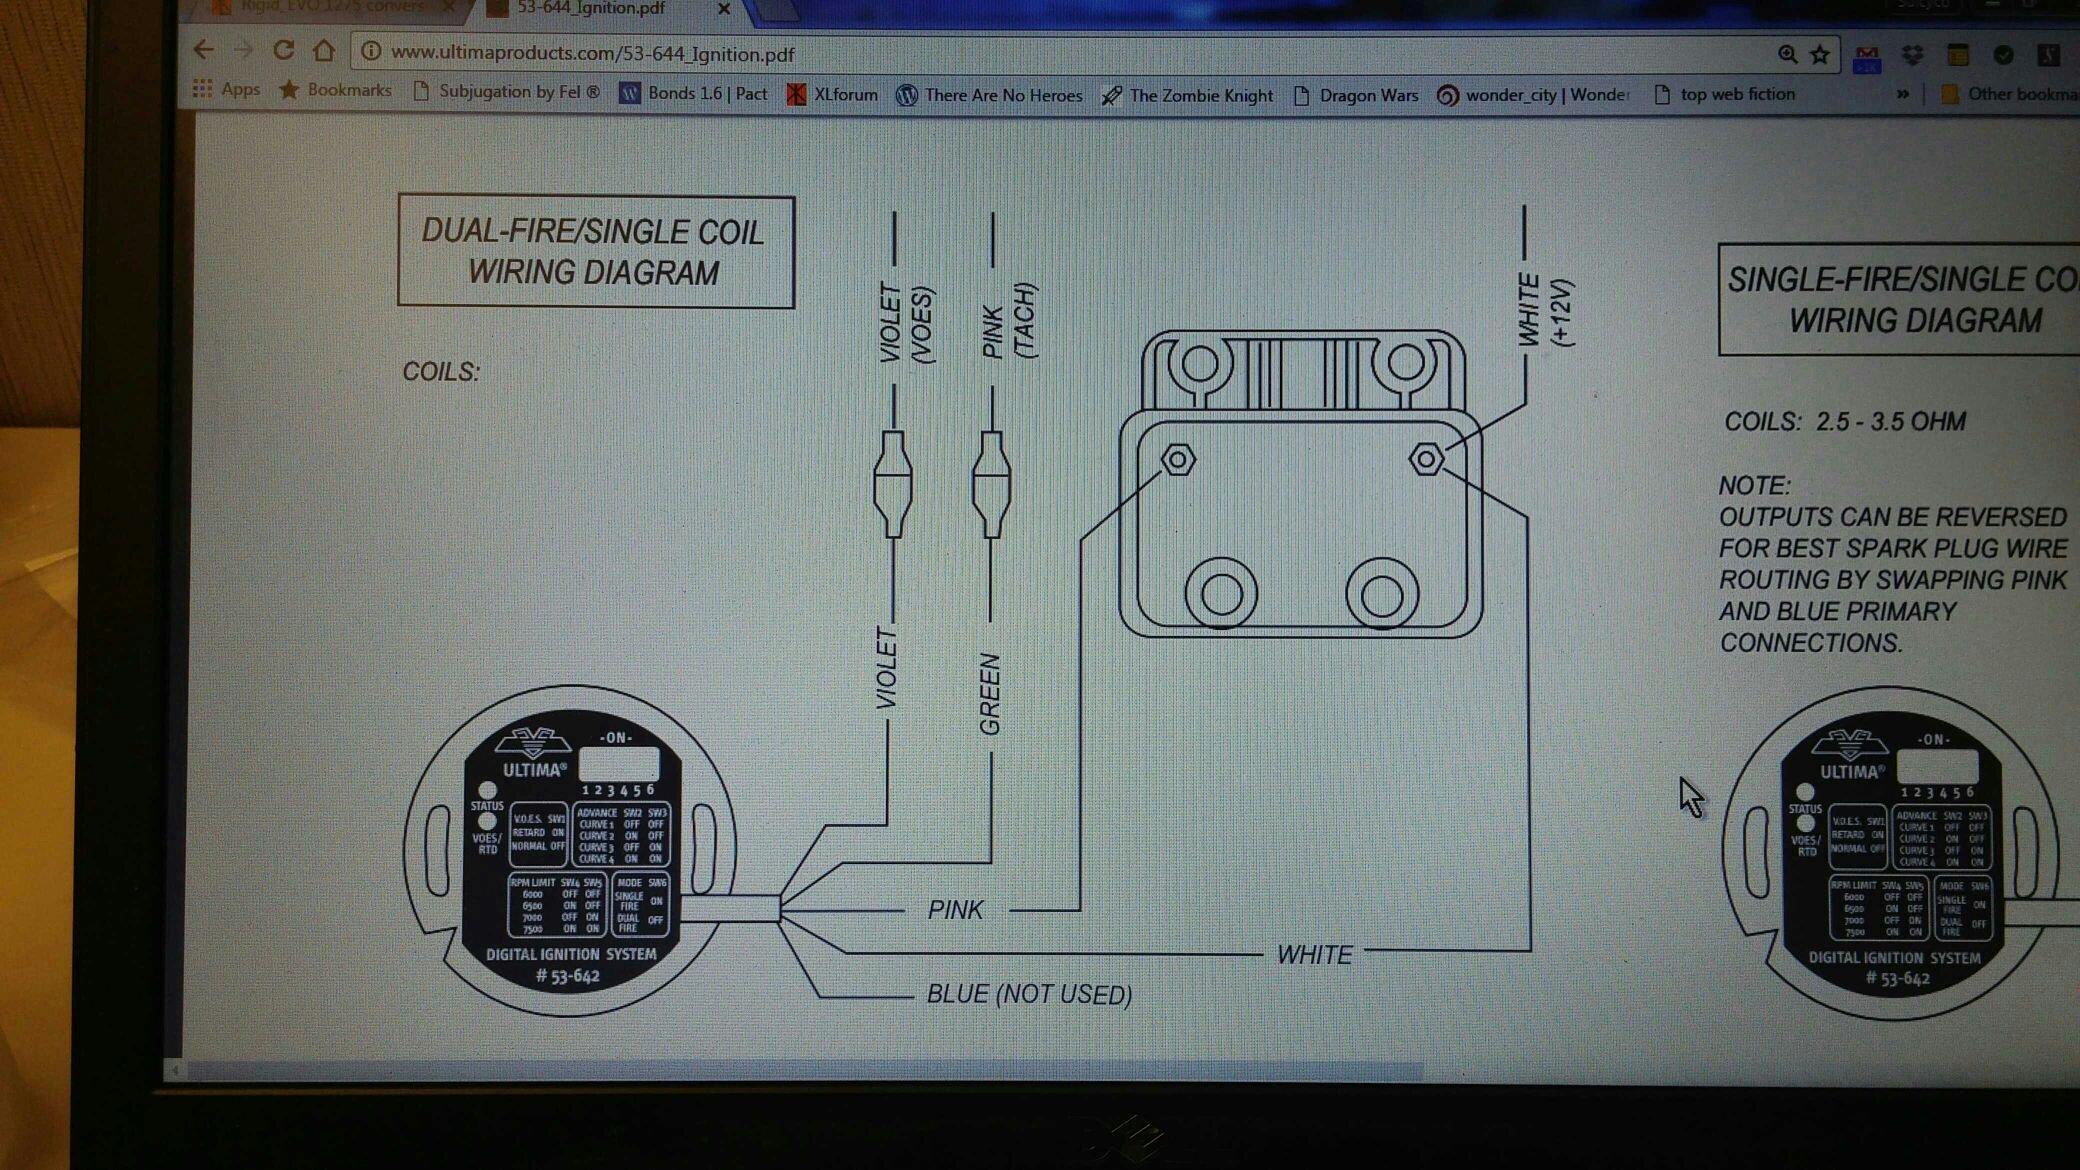 Ultima Digital Ignition System Wiring Diagram